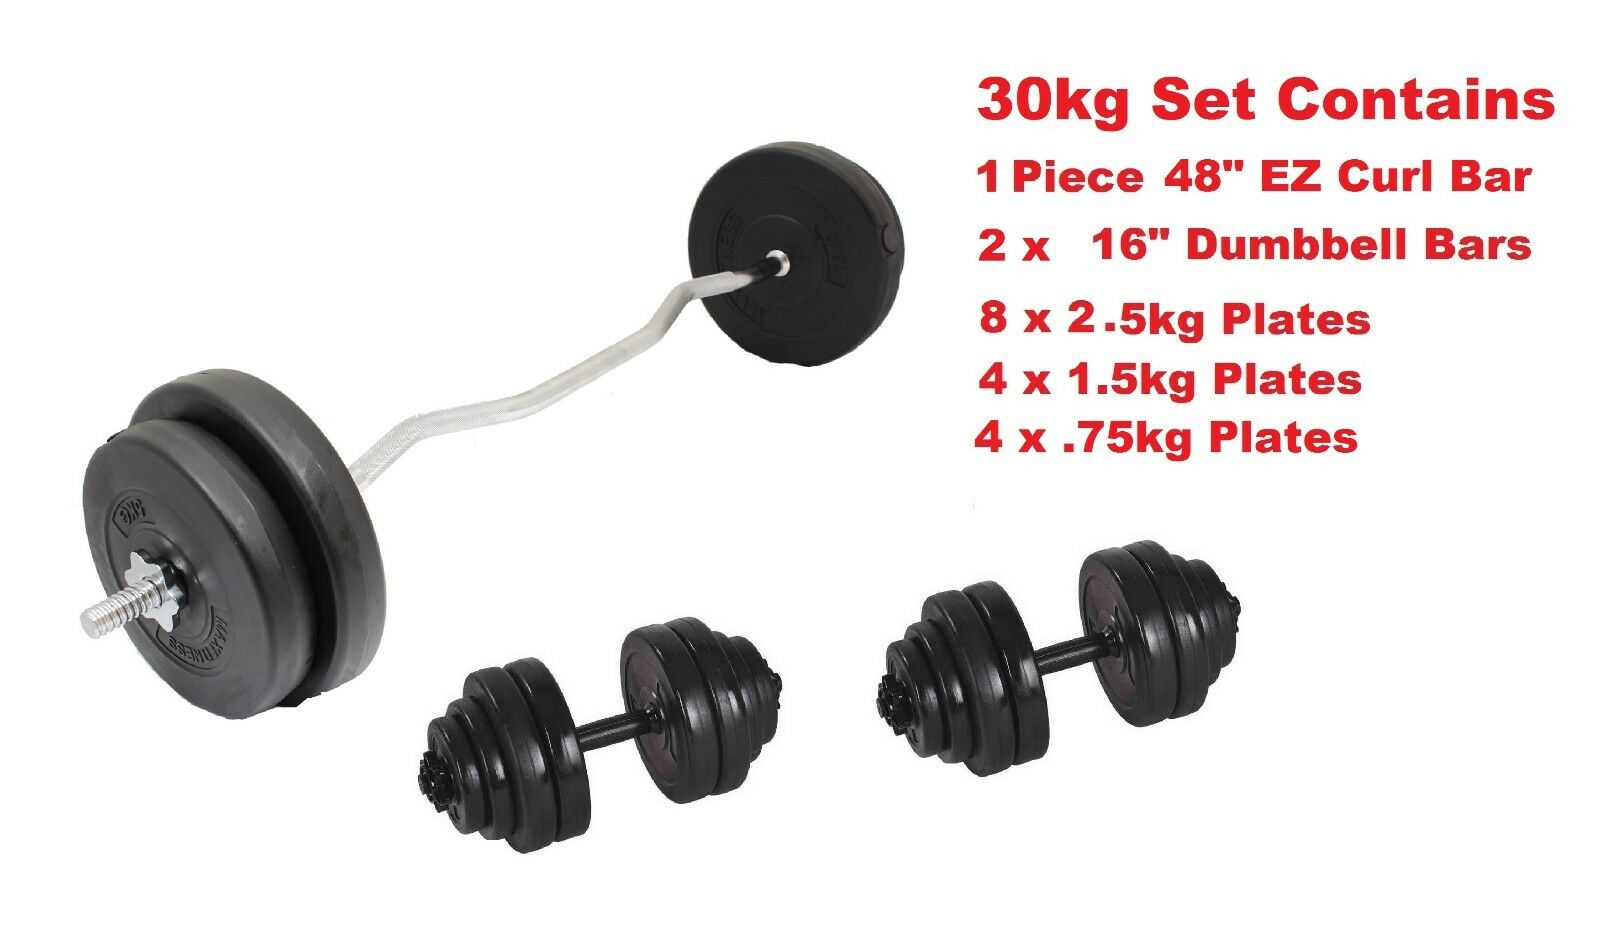 Curl Bar TRICIPITE & bicipite Bar Peso Set 35kg PLUS GRATIS Coppia manubri barre